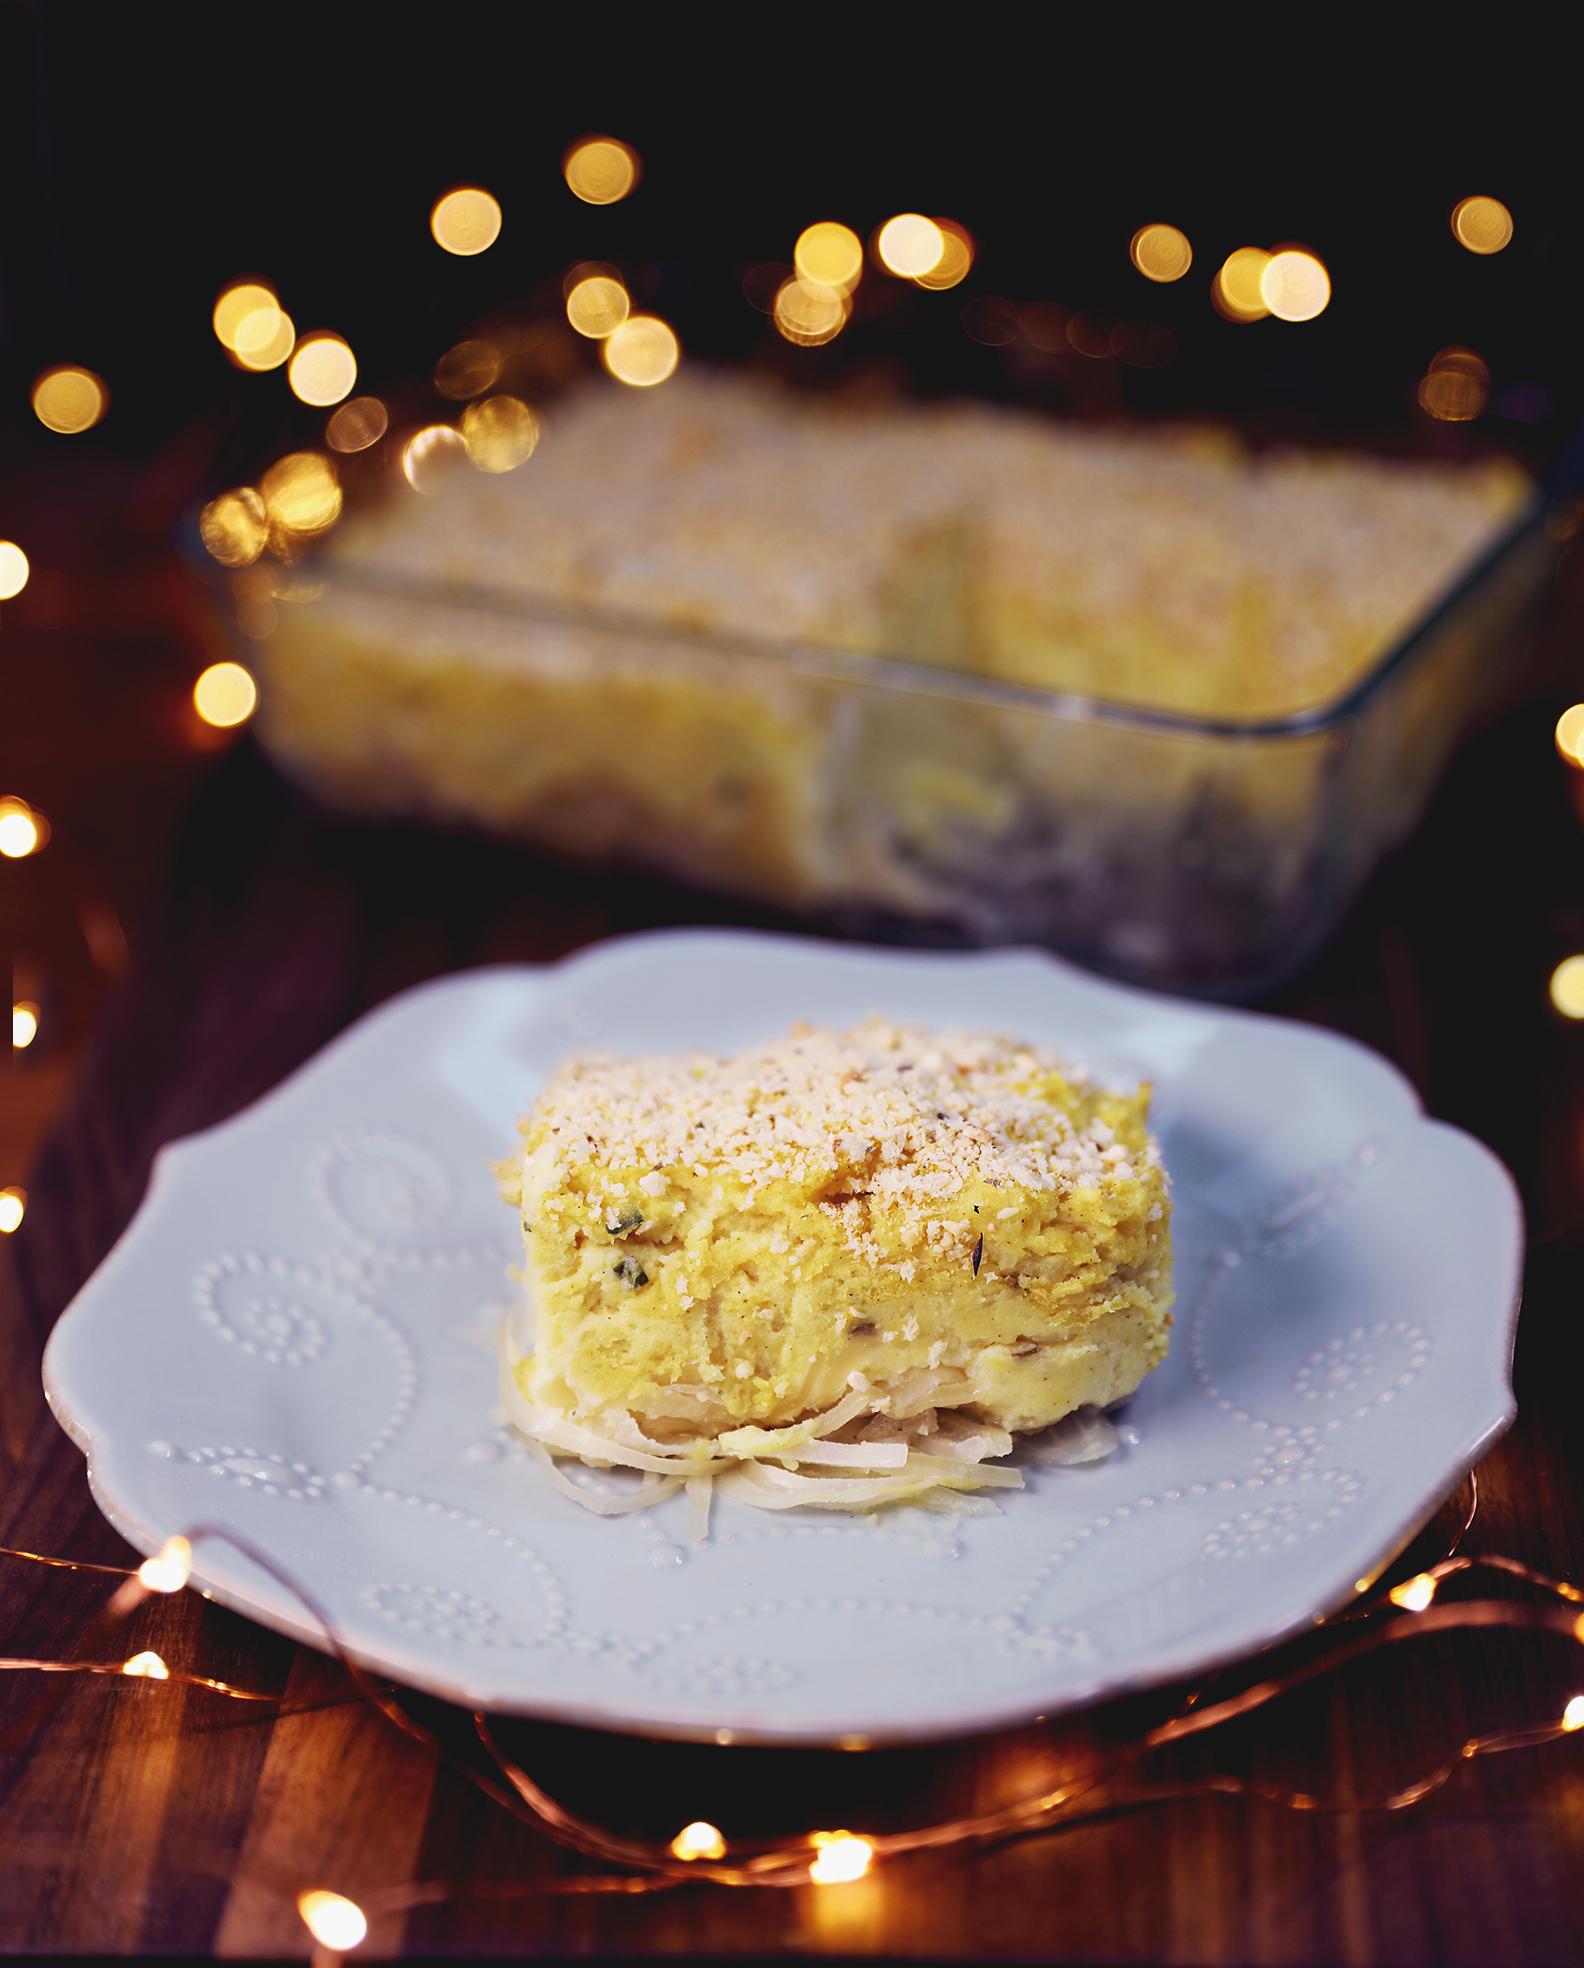 Mashed Potato & Sauerkraut Casserole